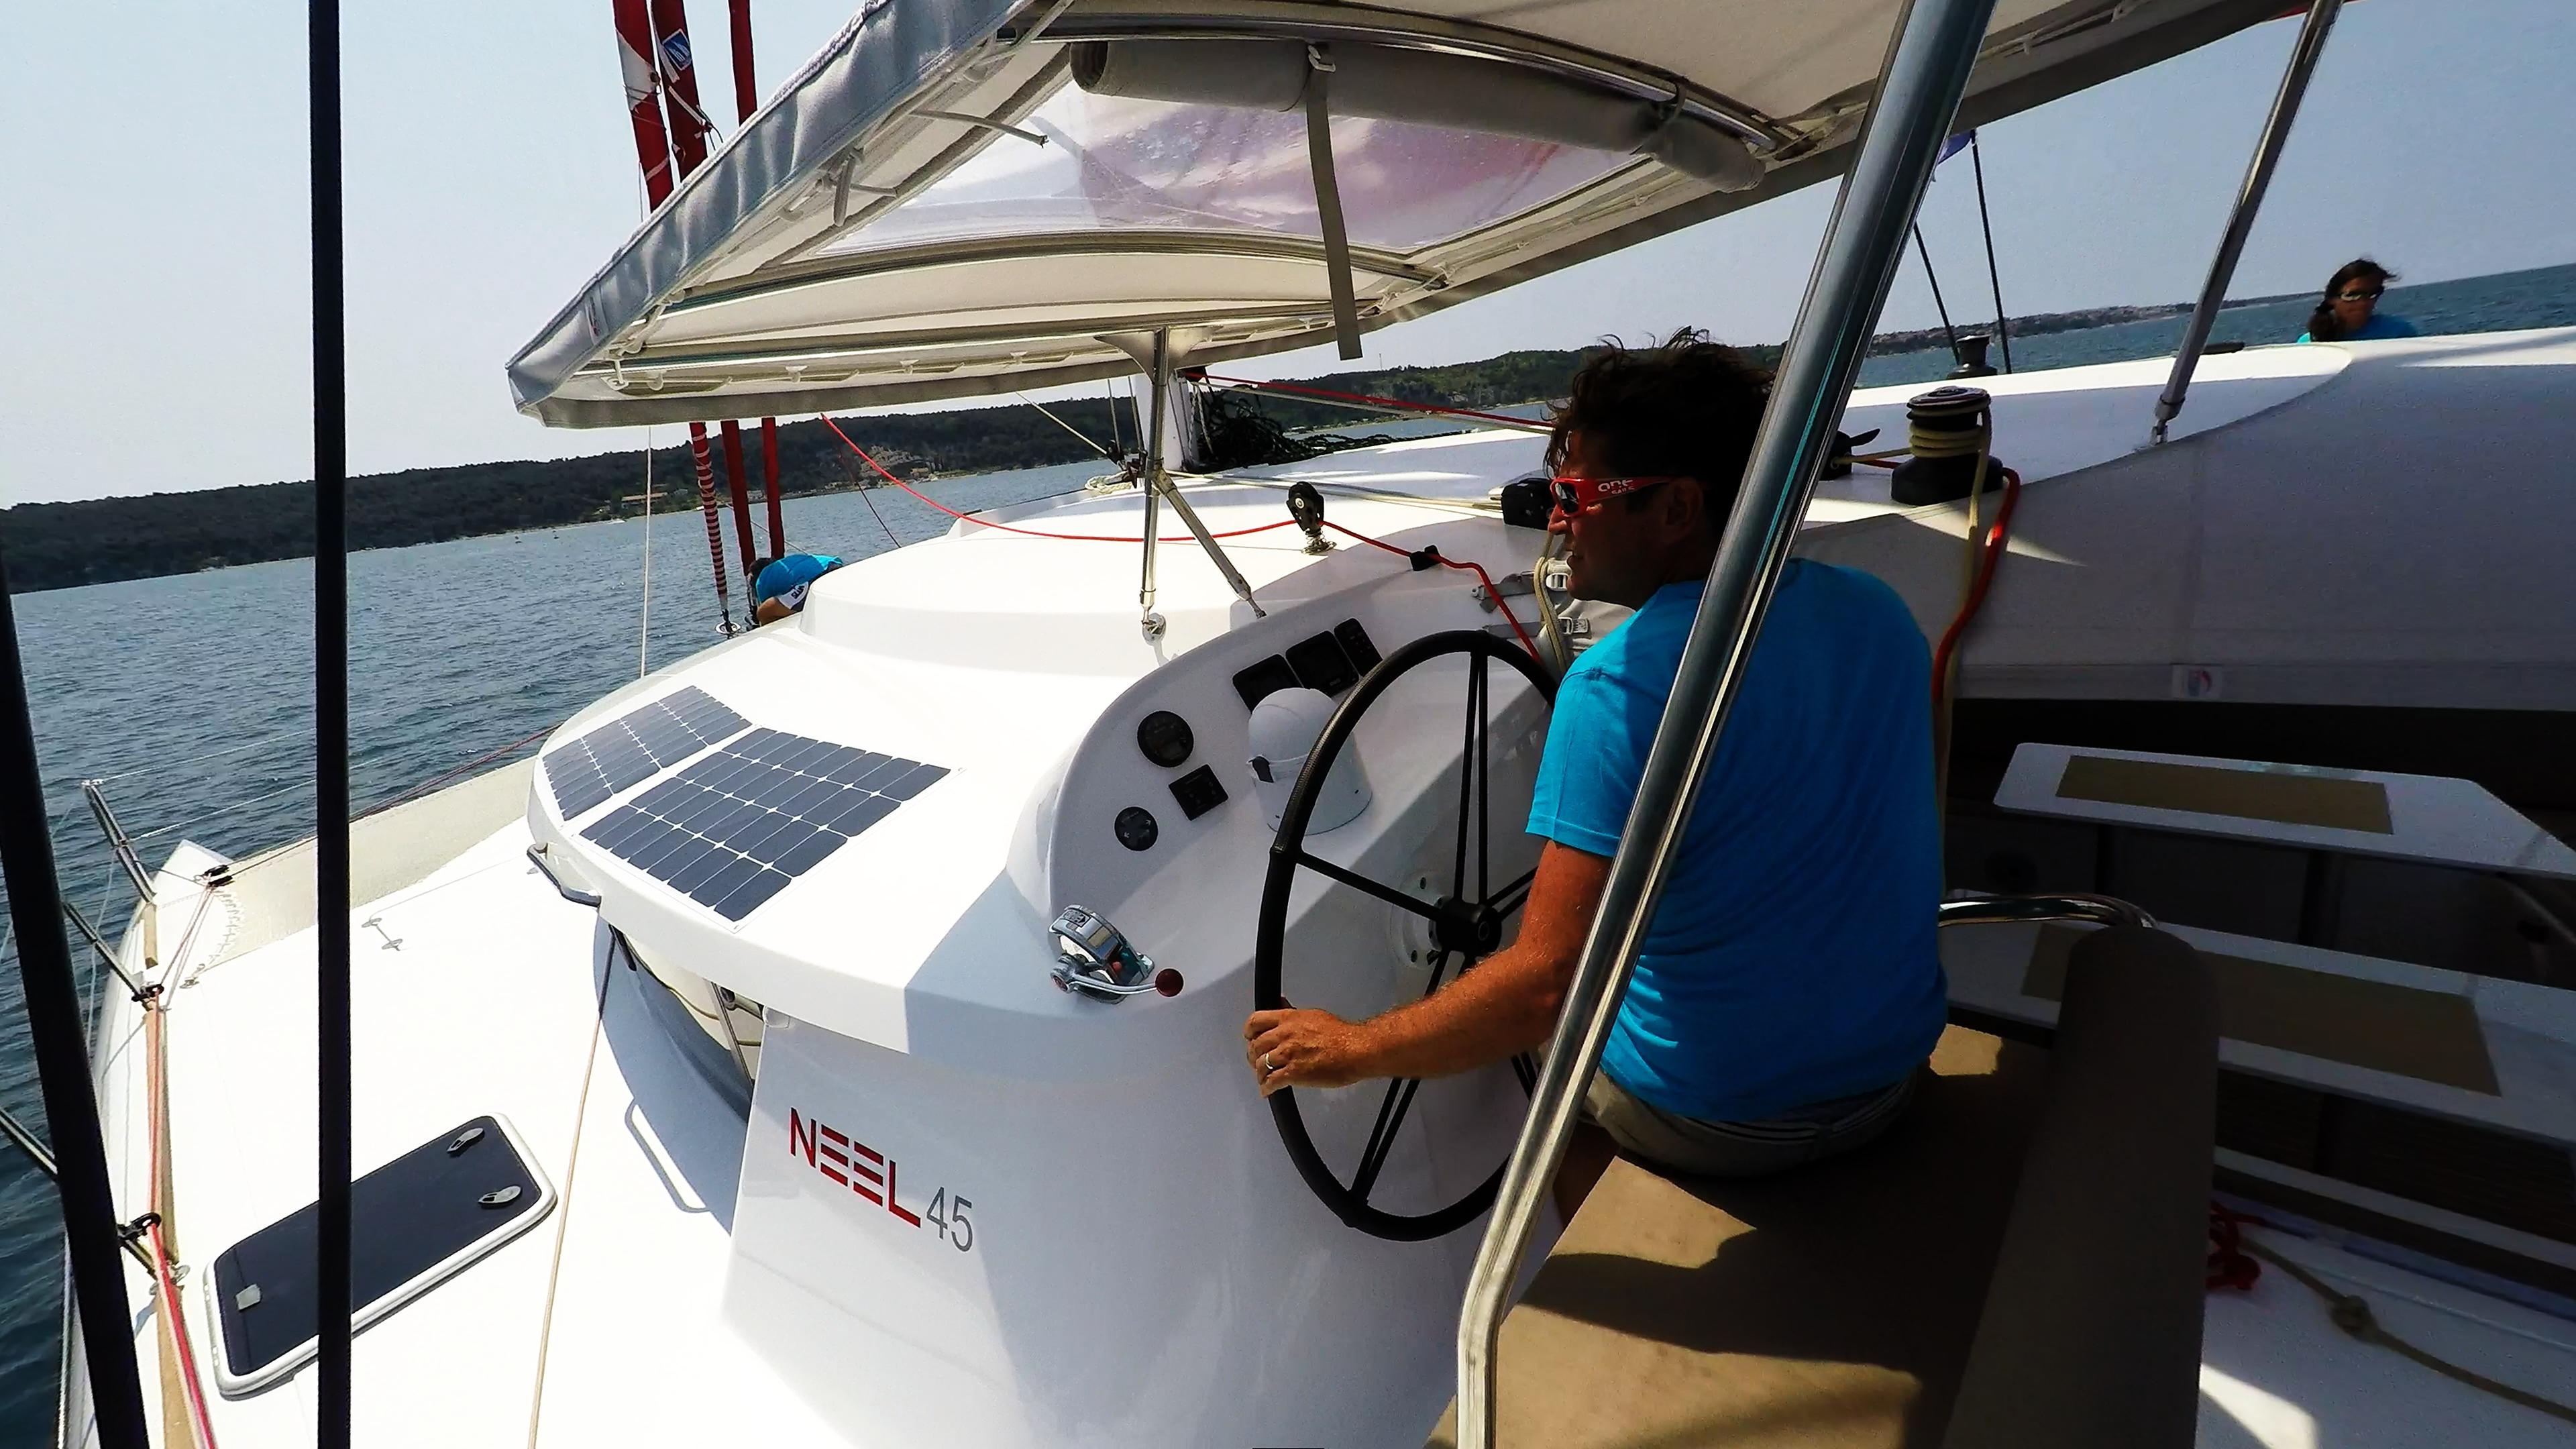 skipper in cockpit di trimarano  barca a vela neel 45